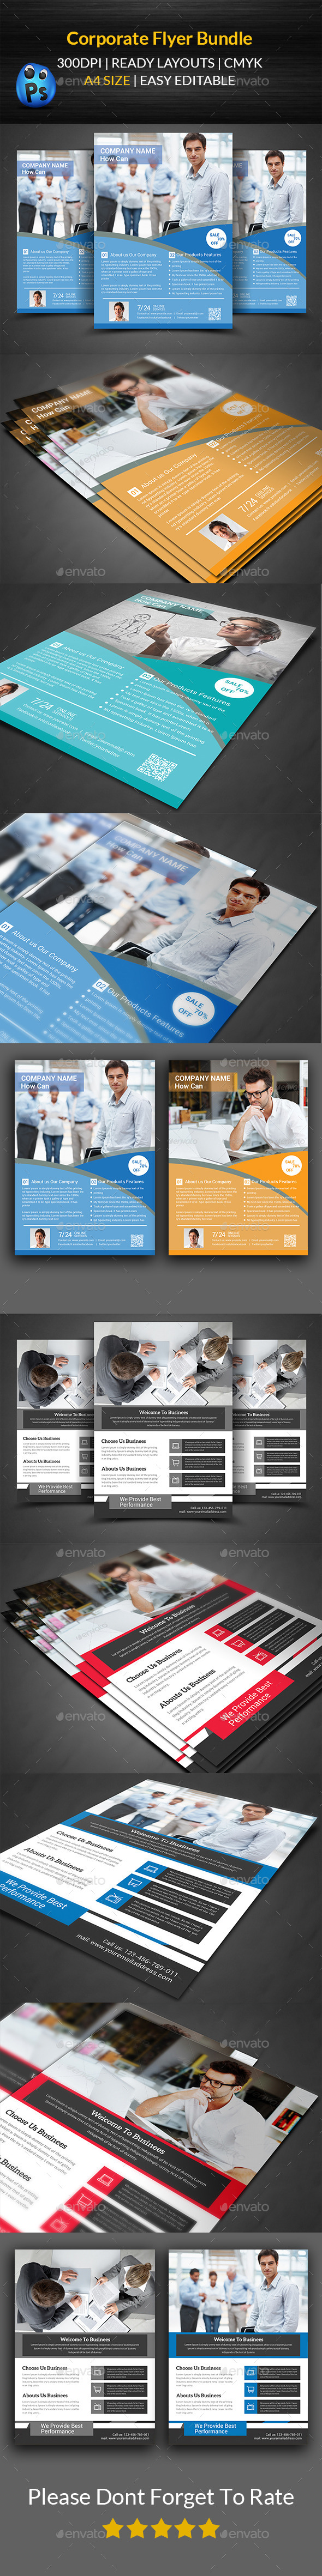 GraphicRiver Corporate Flyer Bundle Templates 11769793